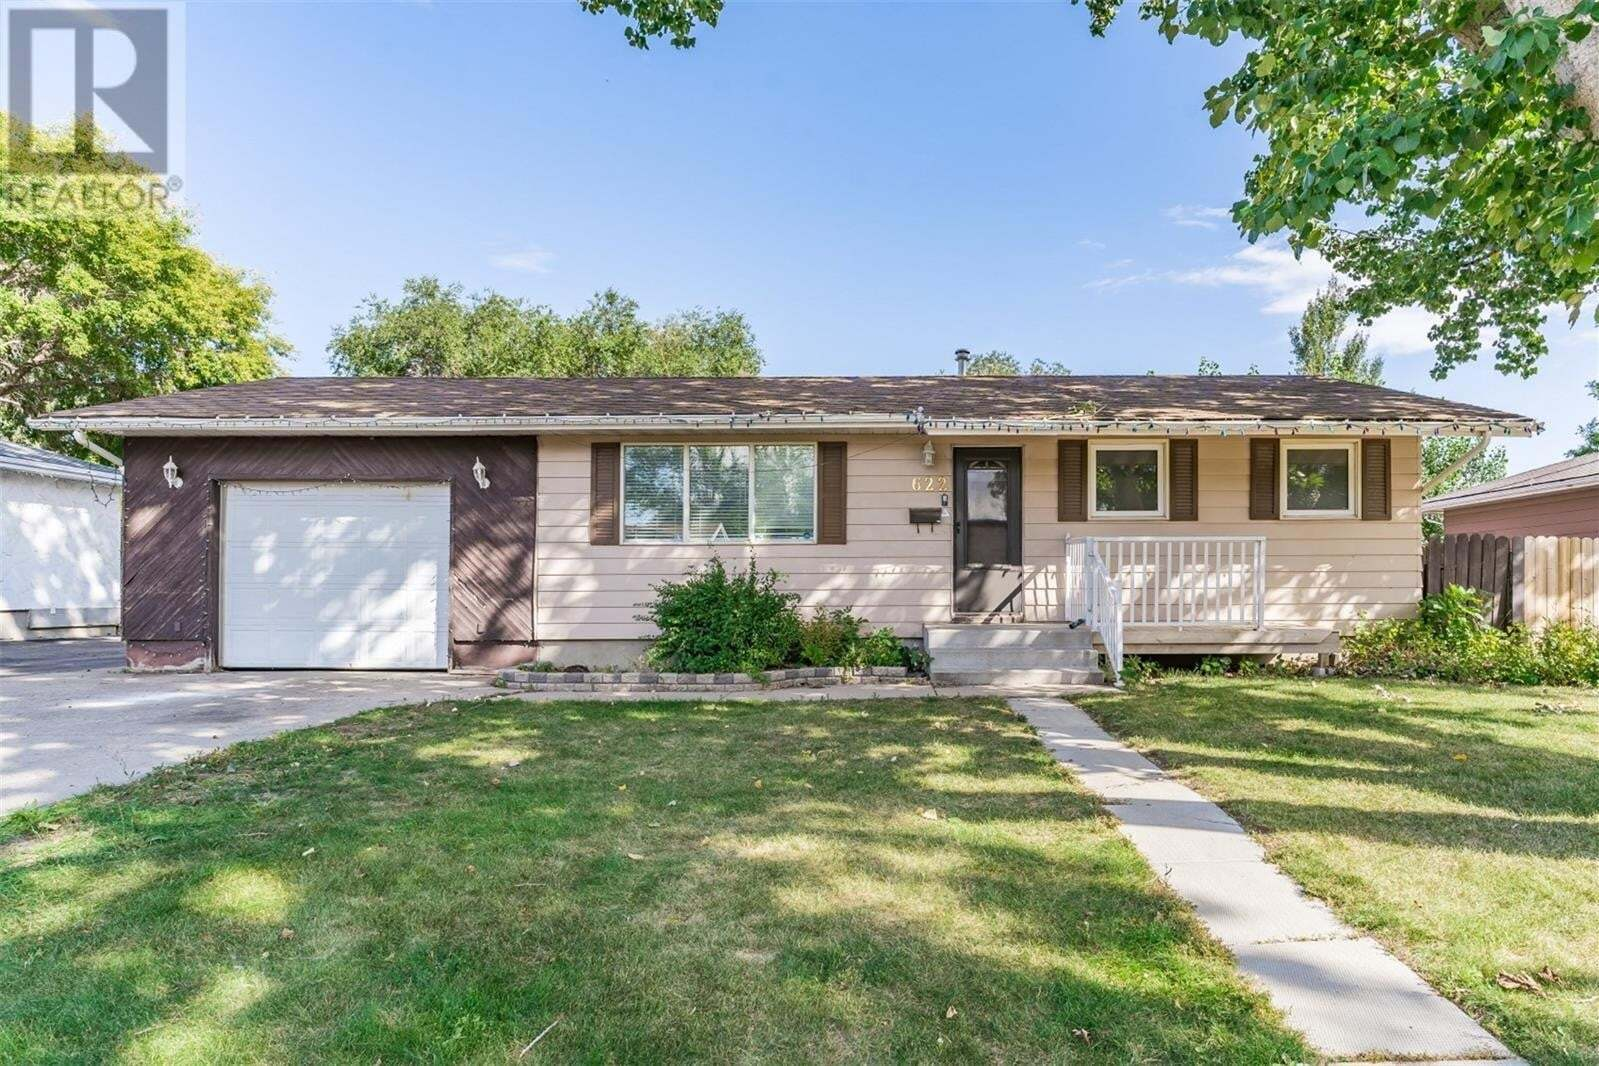 House for sale at 622 Wardlow Rd Saskatoon Saskatchewan - MLS: SK826346